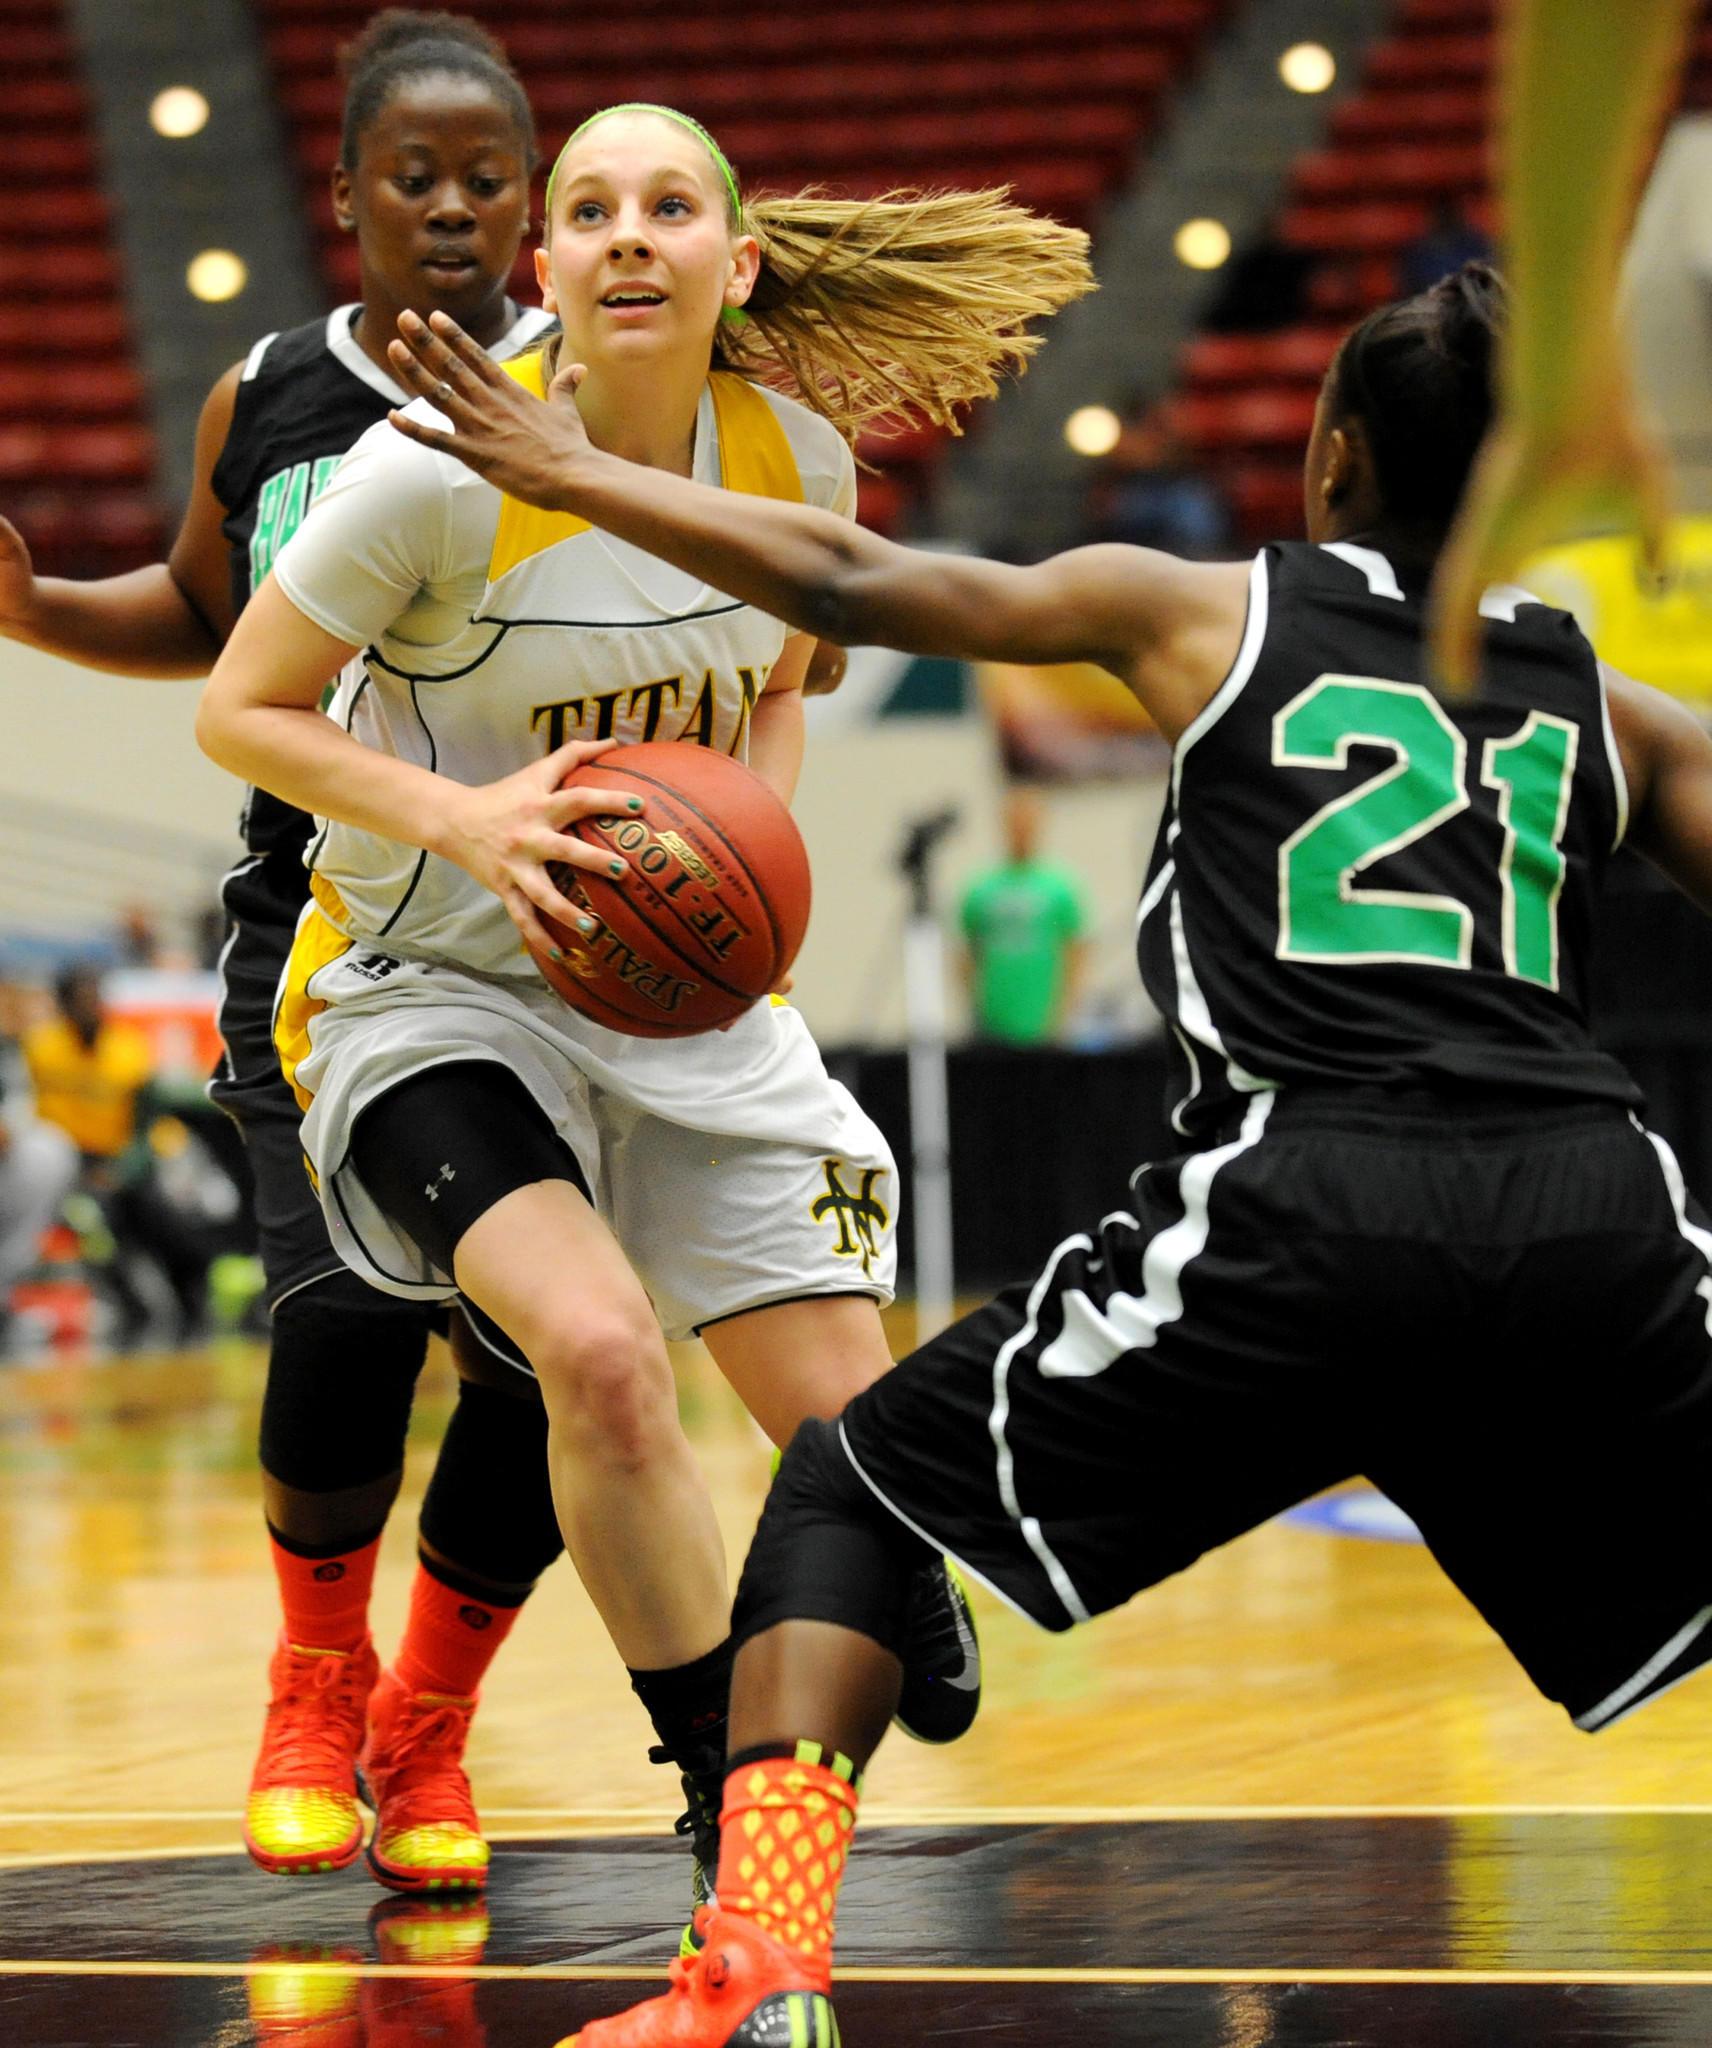 Bernadette Devaney of Nova High goes up for a shot as Jone' Akins (21) defends on the play. 2012-13 FHSAA Girls Basketball Championships Class 7A semifinal. Nova High vs. Haines City High. 2/22/13. Jim Rassol, Sun Sentinel.